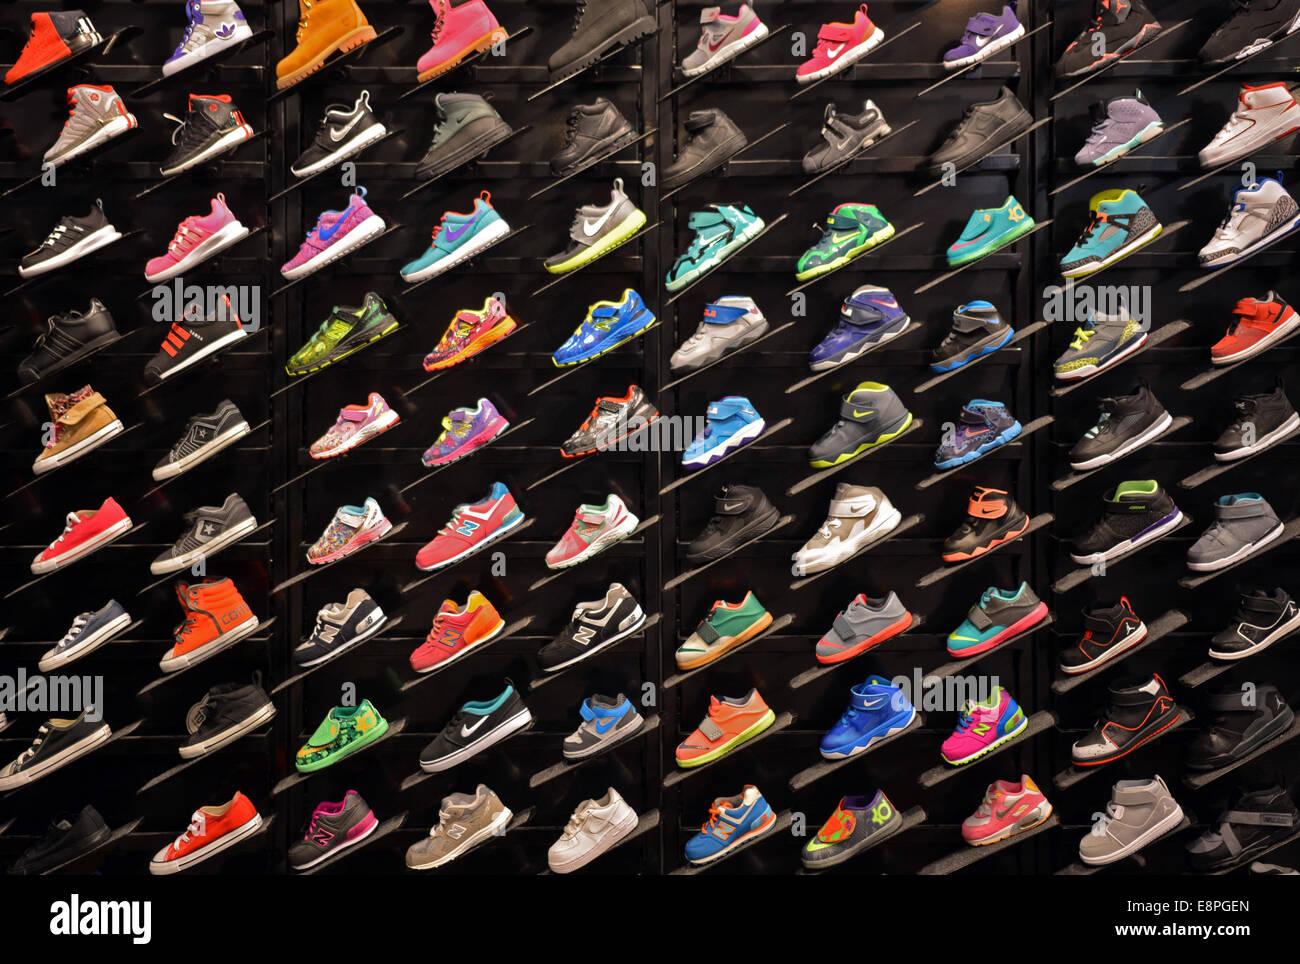 più popolare calzature A basso prezzo Kids Shoes Display Immagini & Kids Shoes Display Fotos Stock ...